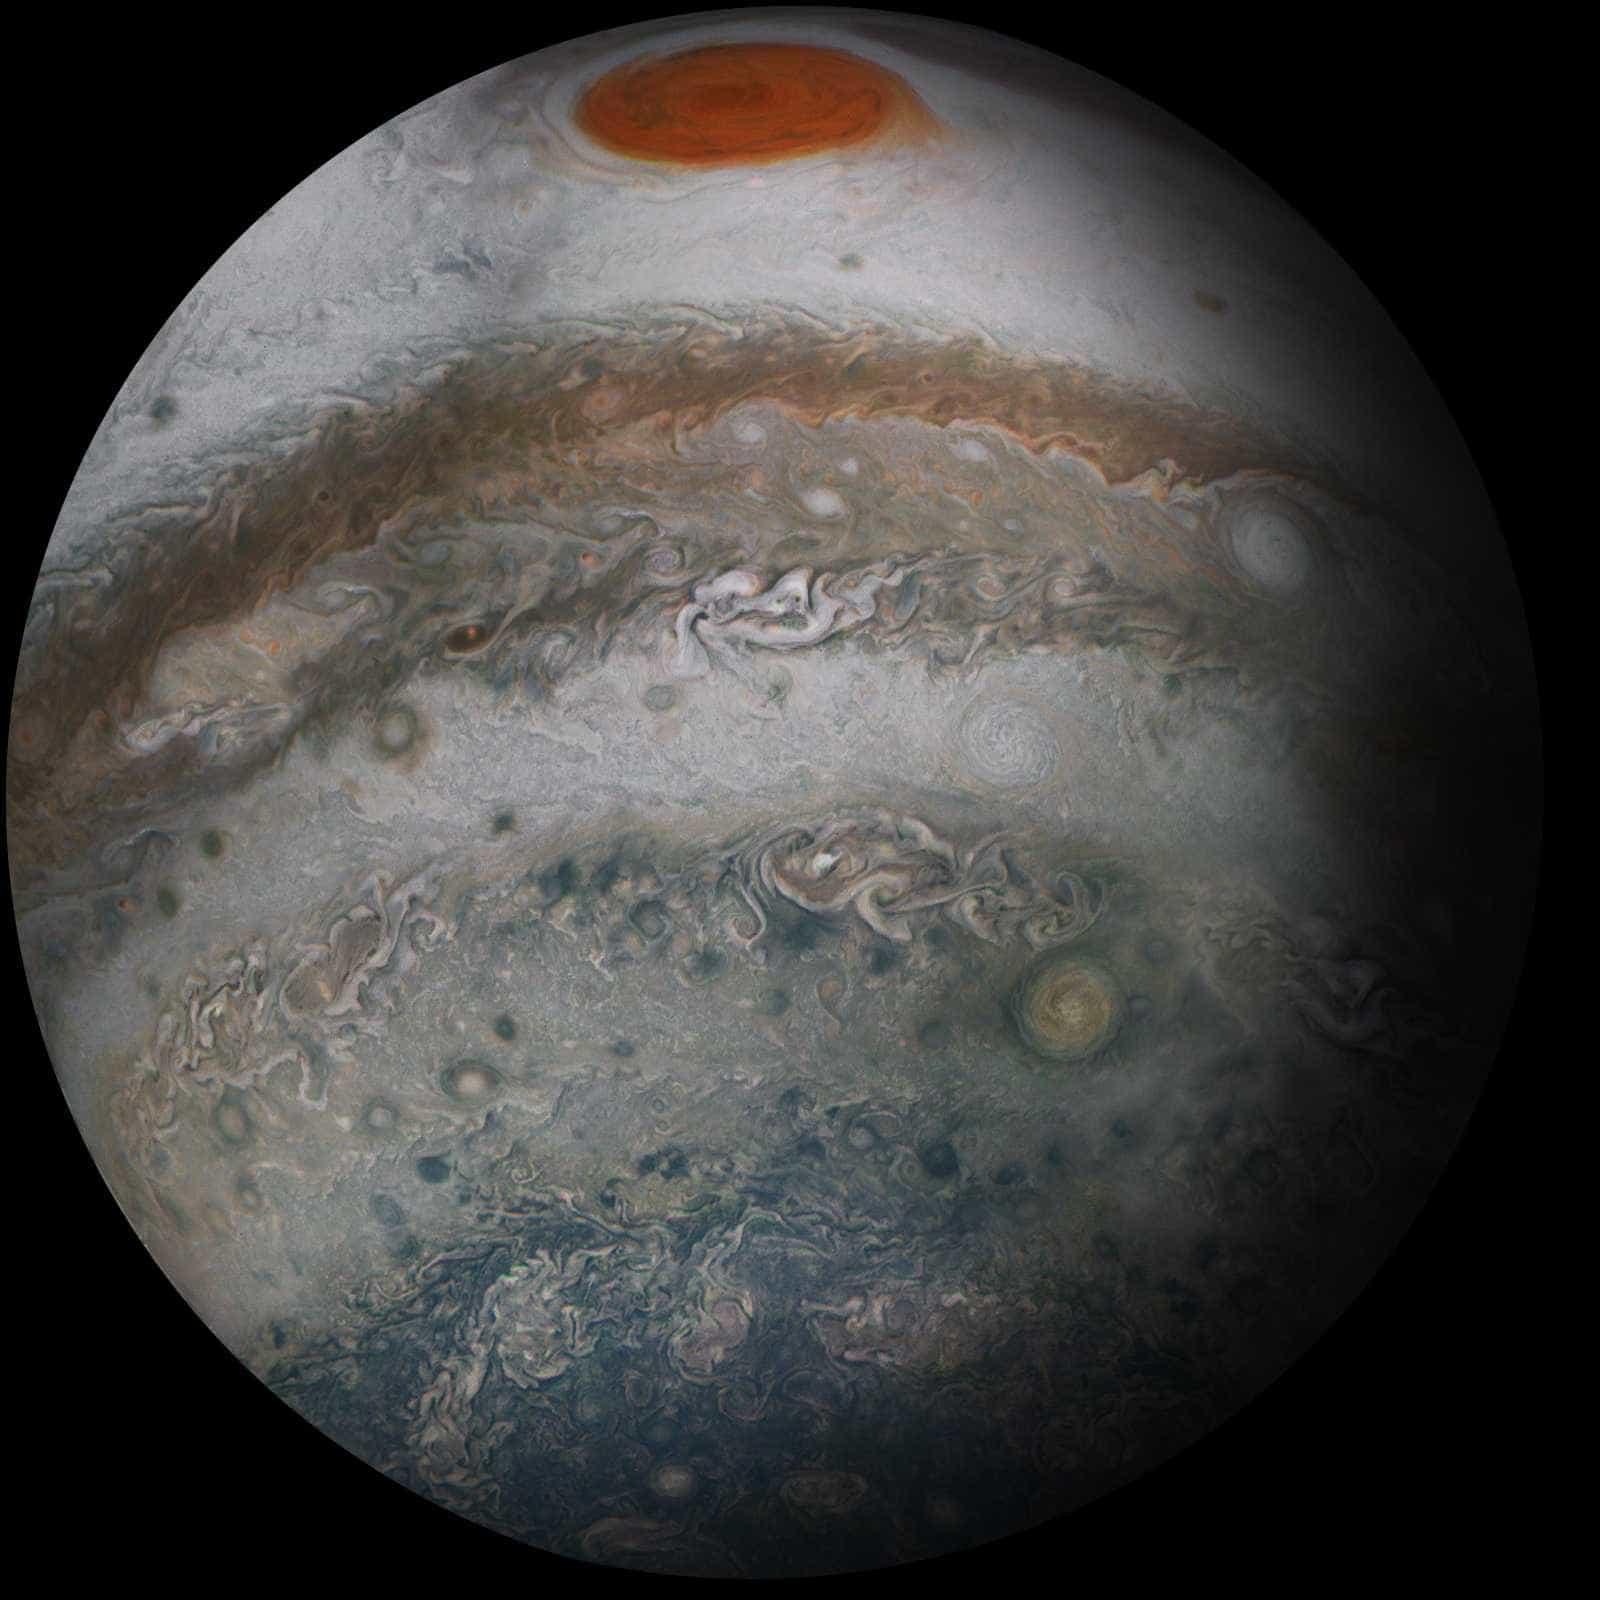 Atmosfera de Júpiter tem relâmpagos como os da Terra